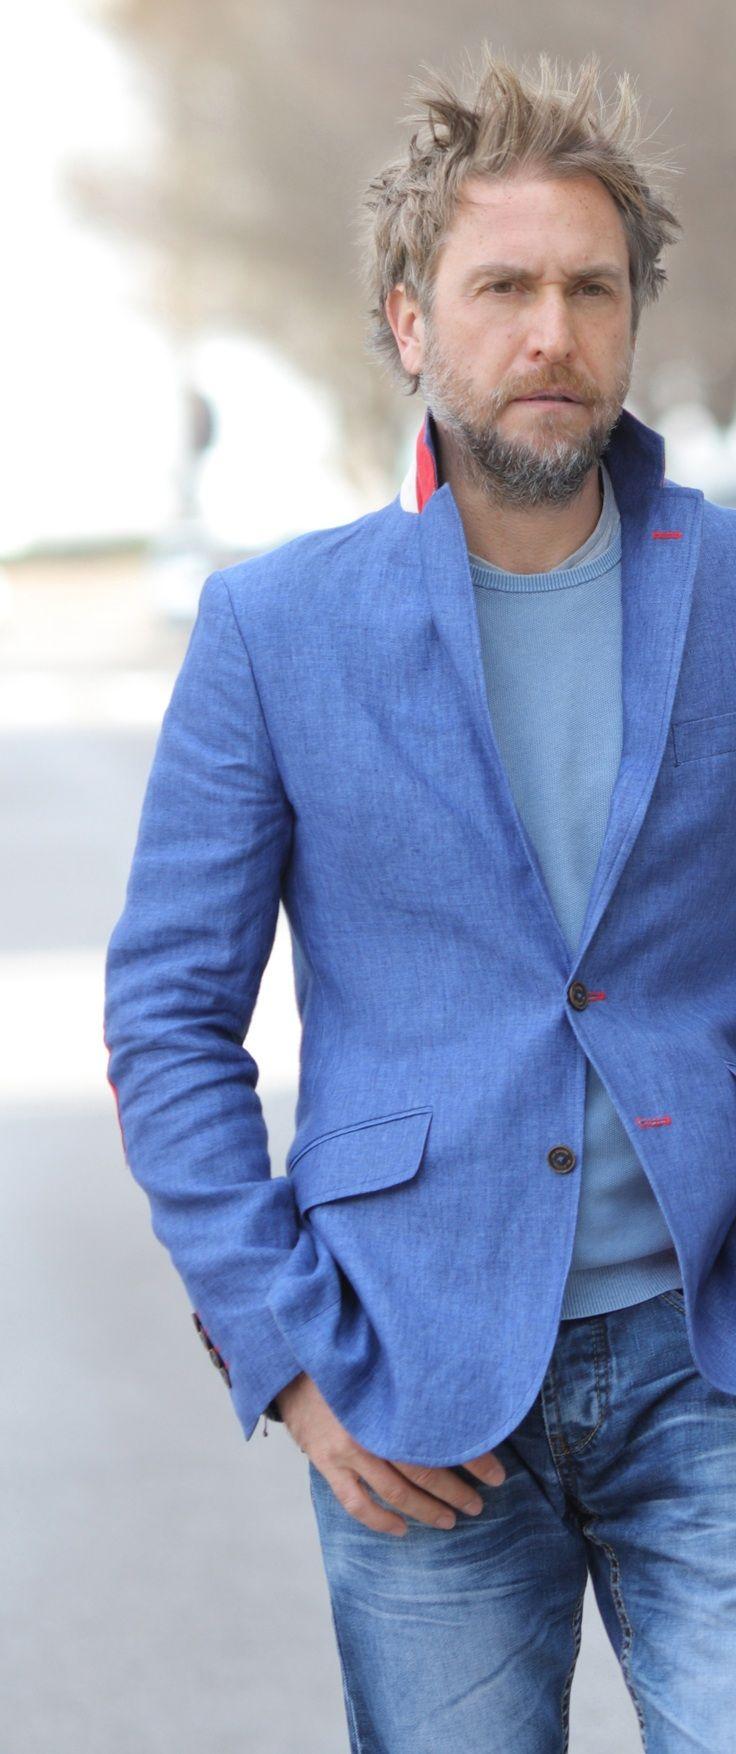 miGUEL HERRANZ > photo by Víctor Cucart via Instagram @miguelherranz_design | victorcucart | men style | cool | photographer | fashionart | artwork | design | designer | jacket | blue blazer | el ganso | men's fashion | casual wear | my style | man | photography | portrait | designers